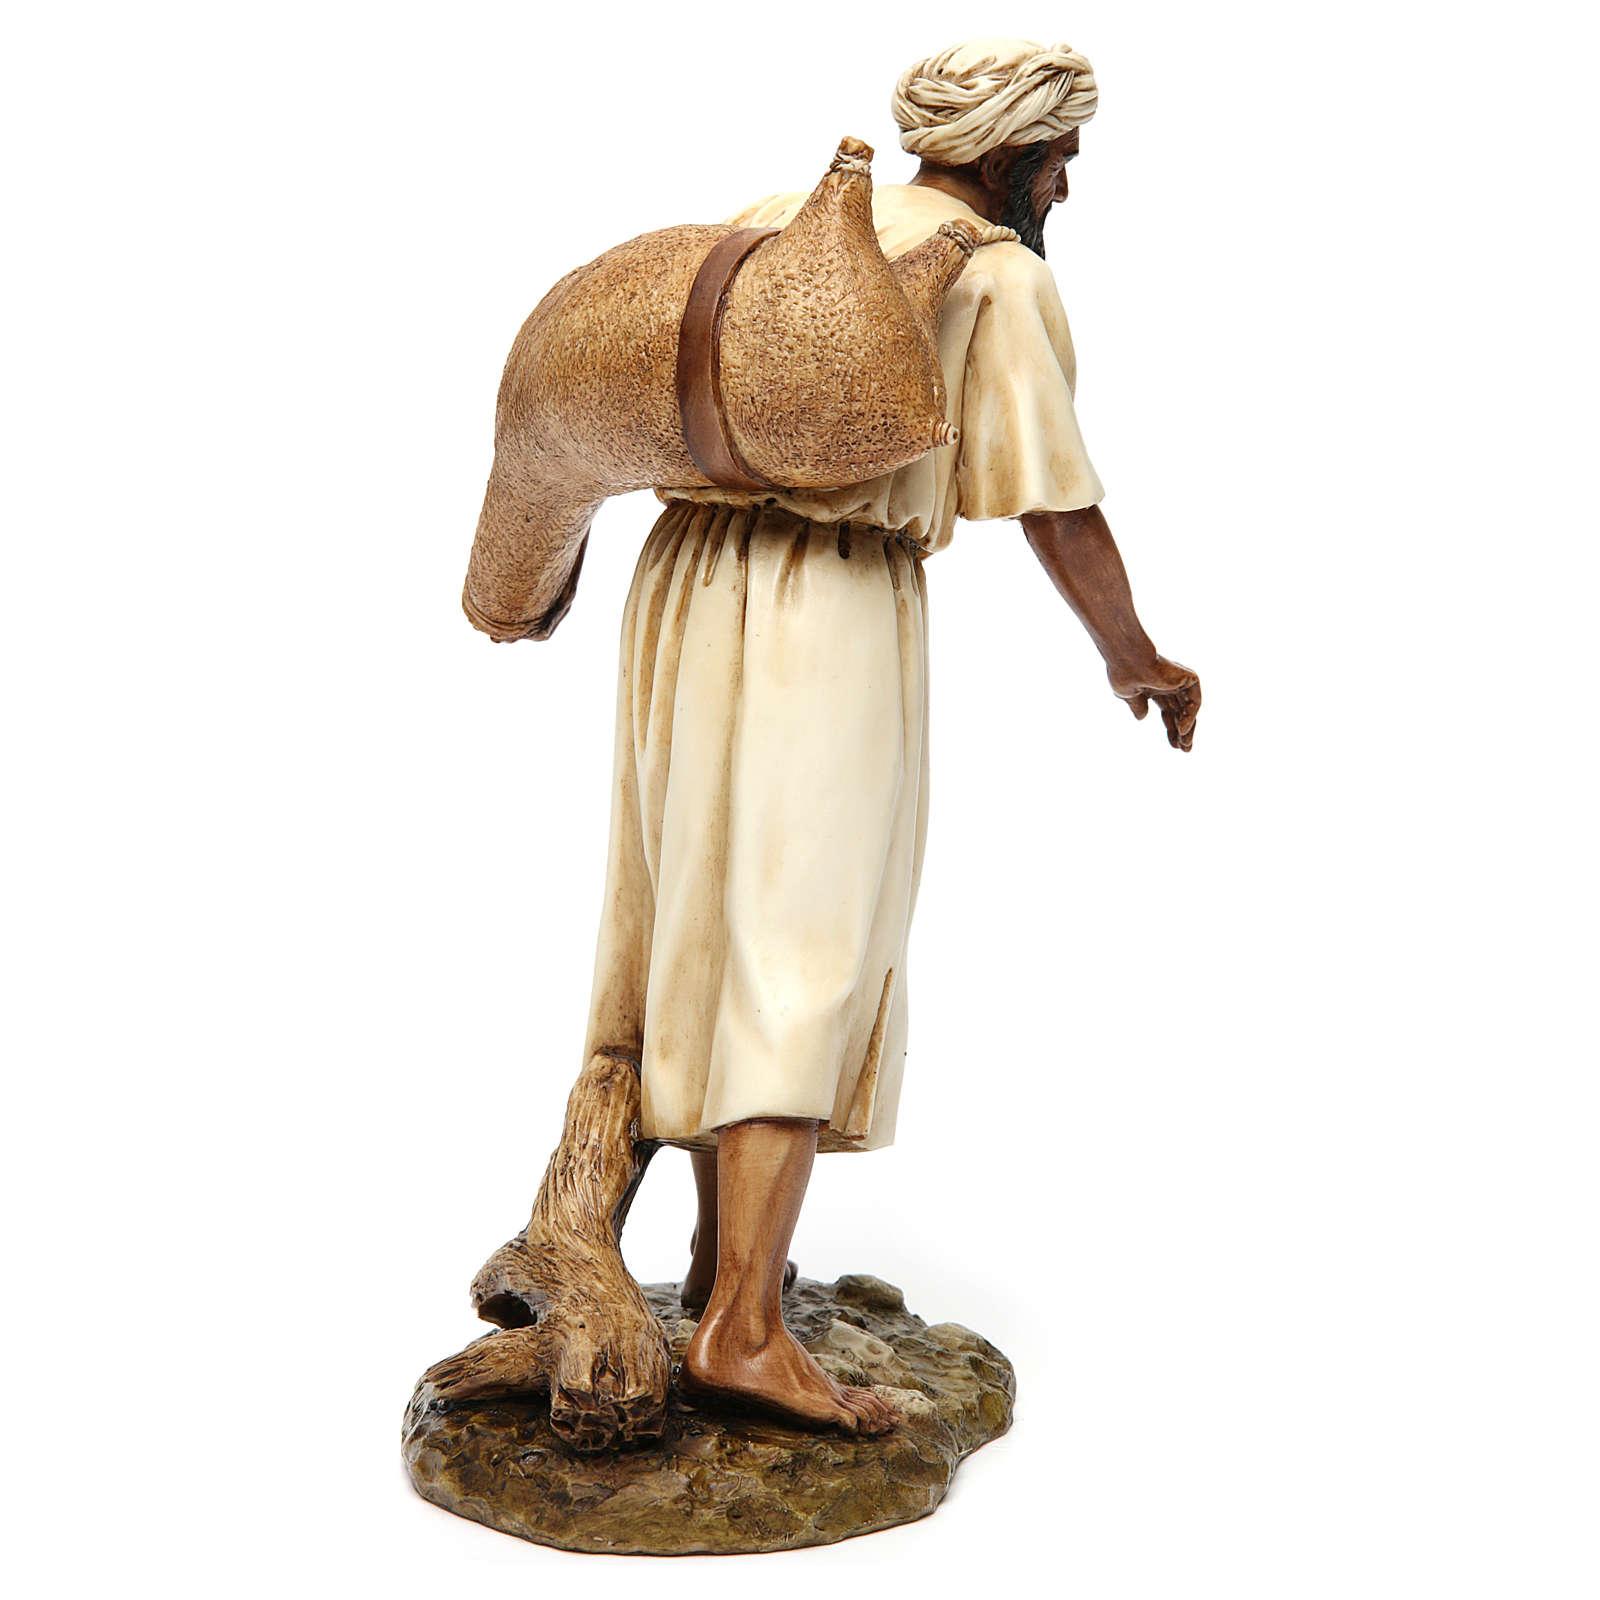 Water-carrier arabian style for Moranduzzo Nativity Scene 20cm 4